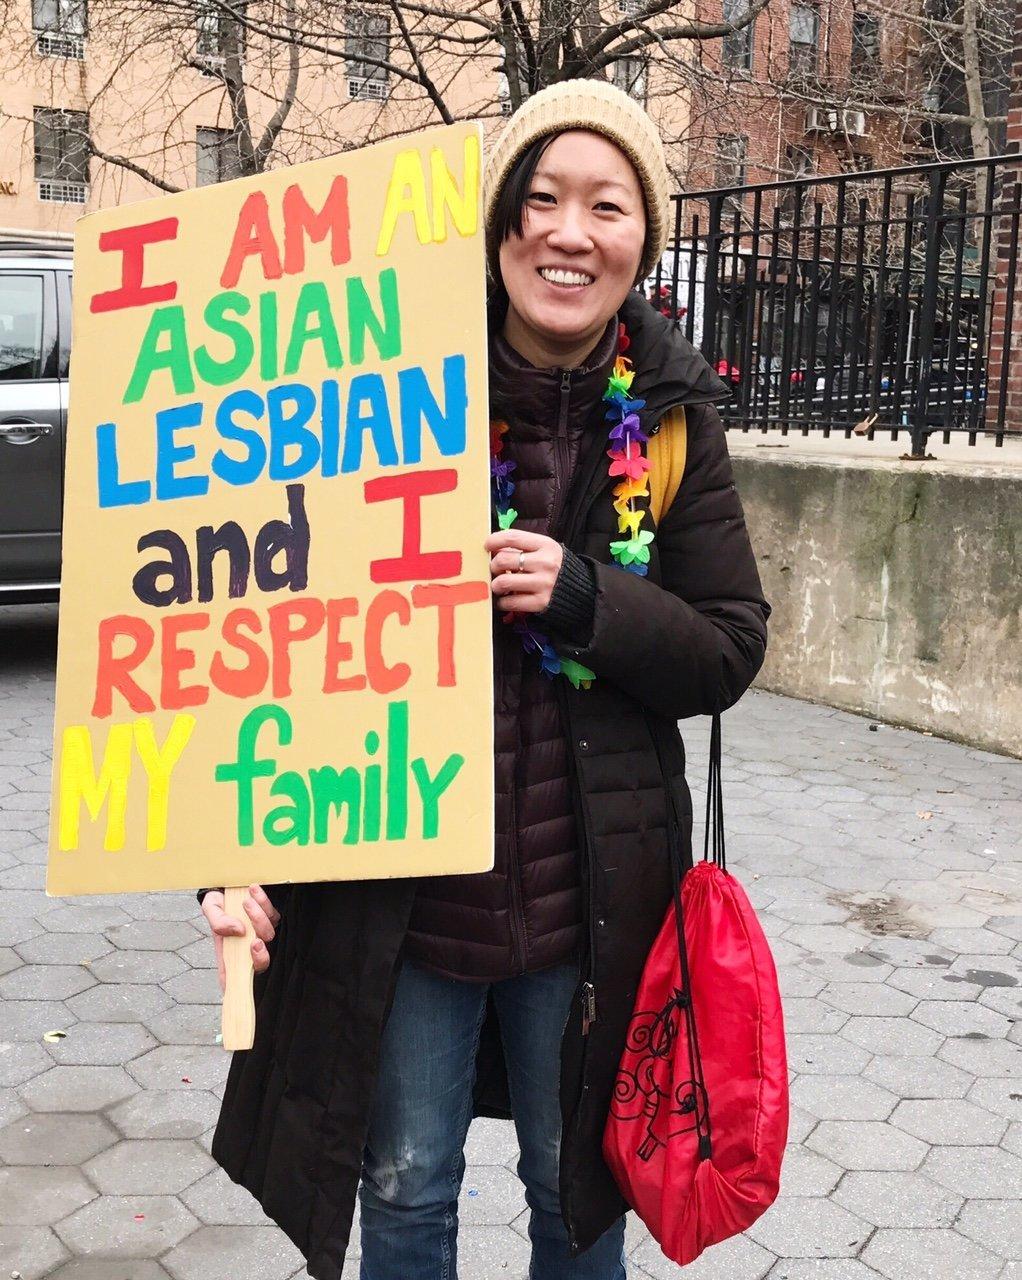 Mom lesbian Chinese